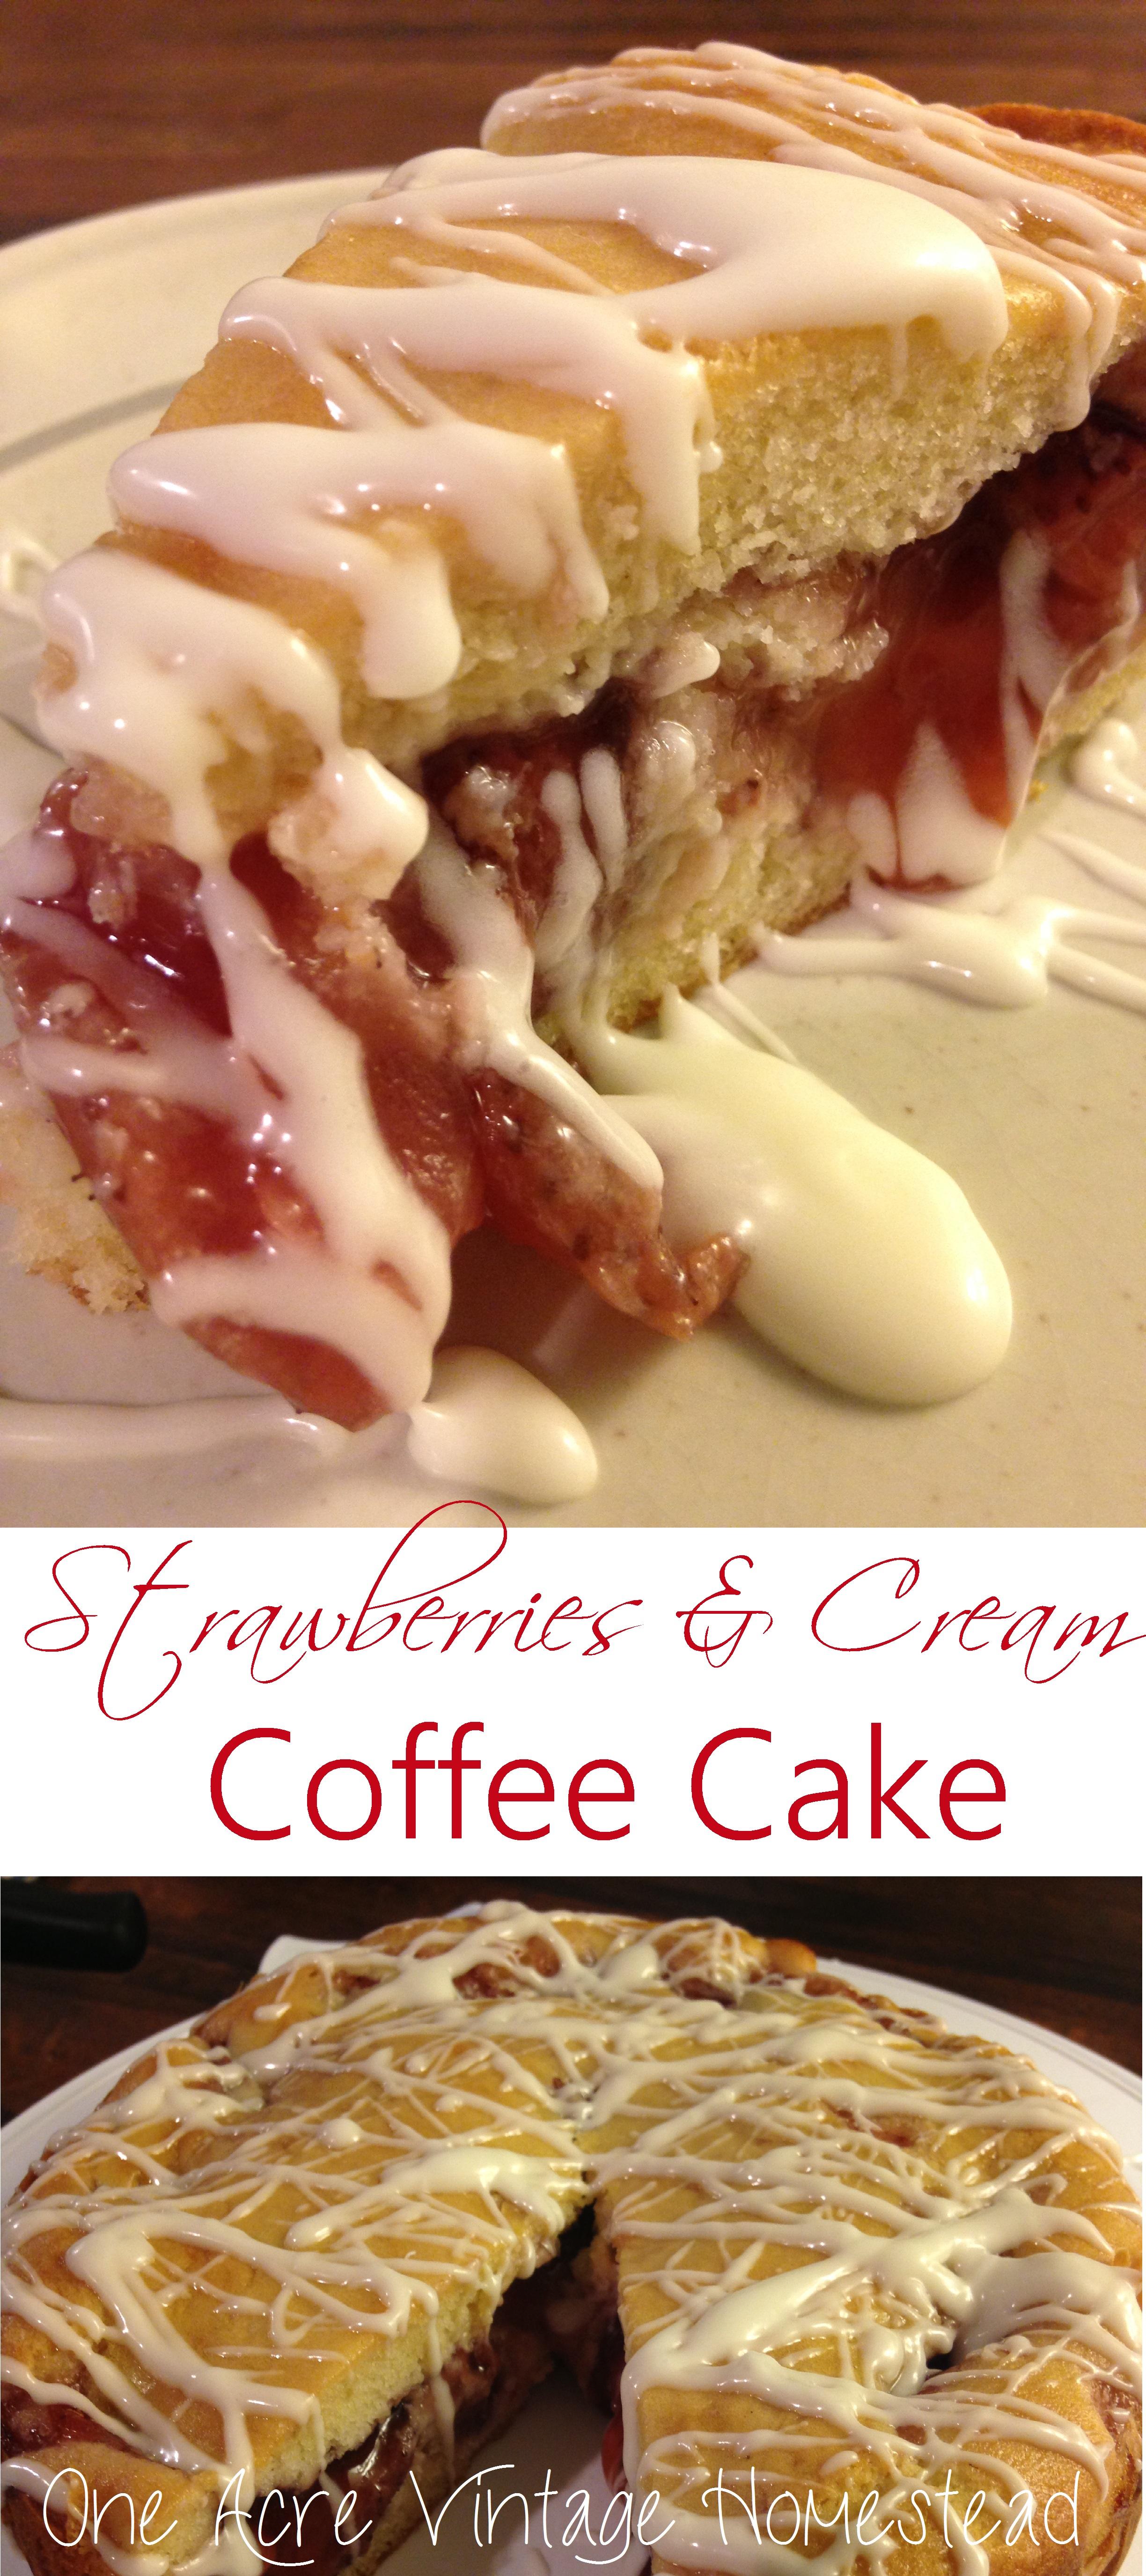 Basic Coffee Cake Recipe From Scratch